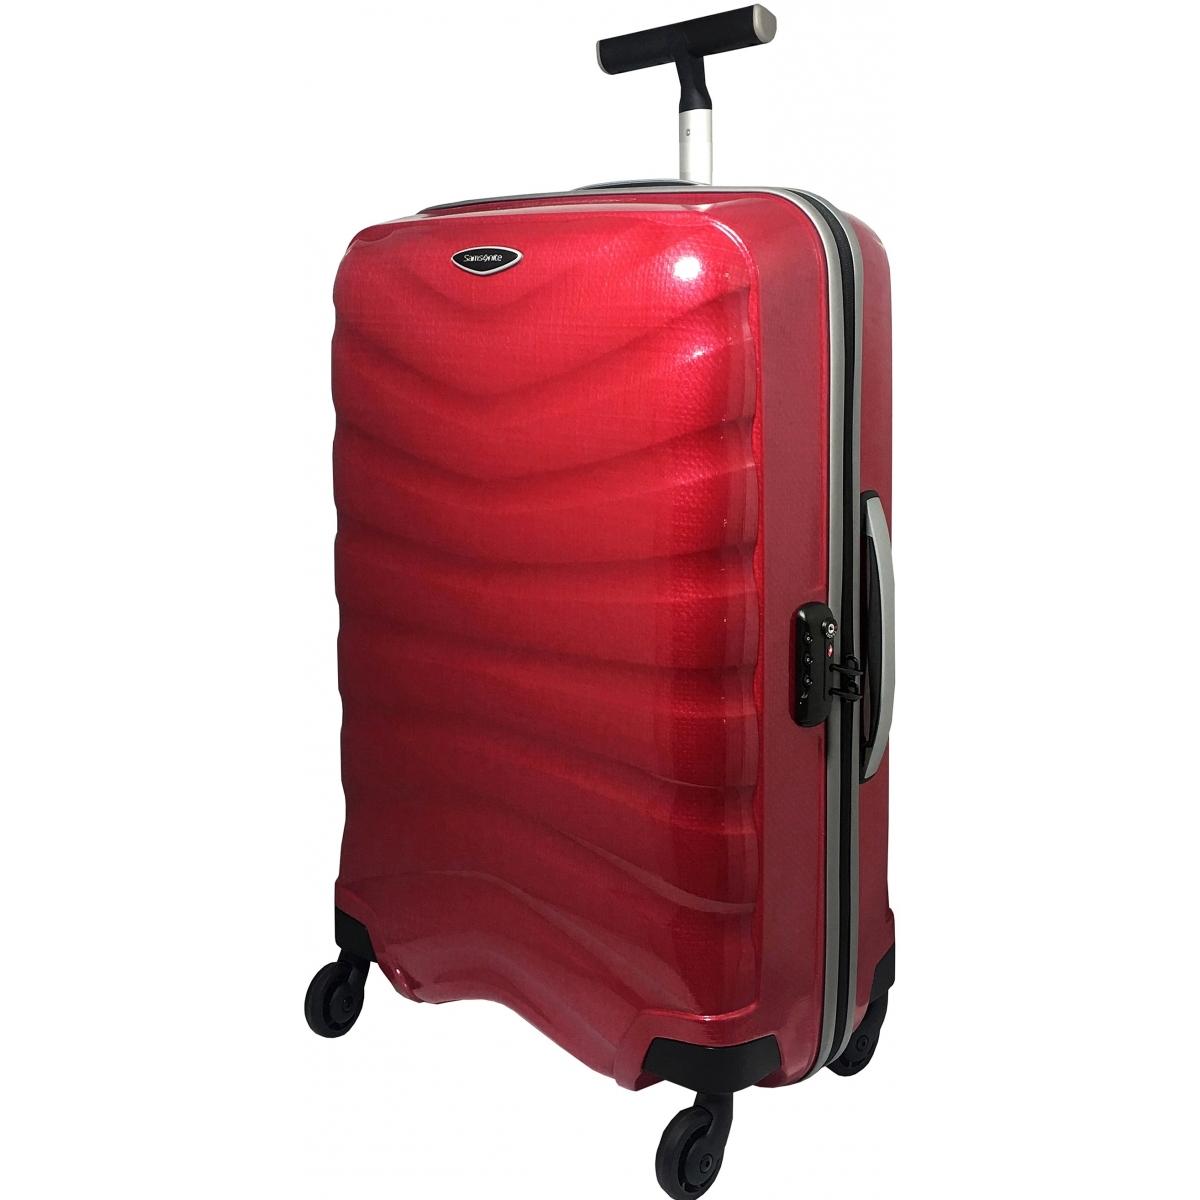 valise samsonite firelite spinner 81 cm taille xl rouge firelite84 couleur principale. Black Bedroom Furniture Sets. Home Design Ideas